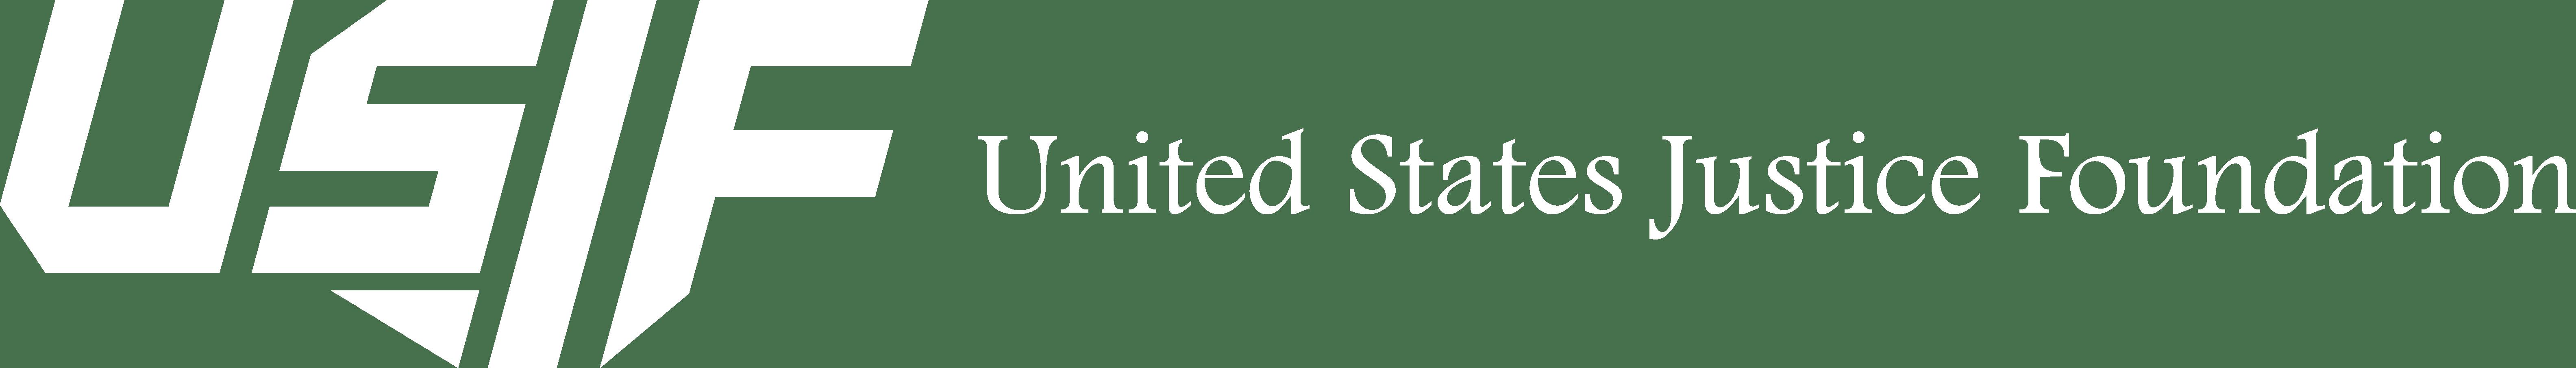 US Justice Foundation